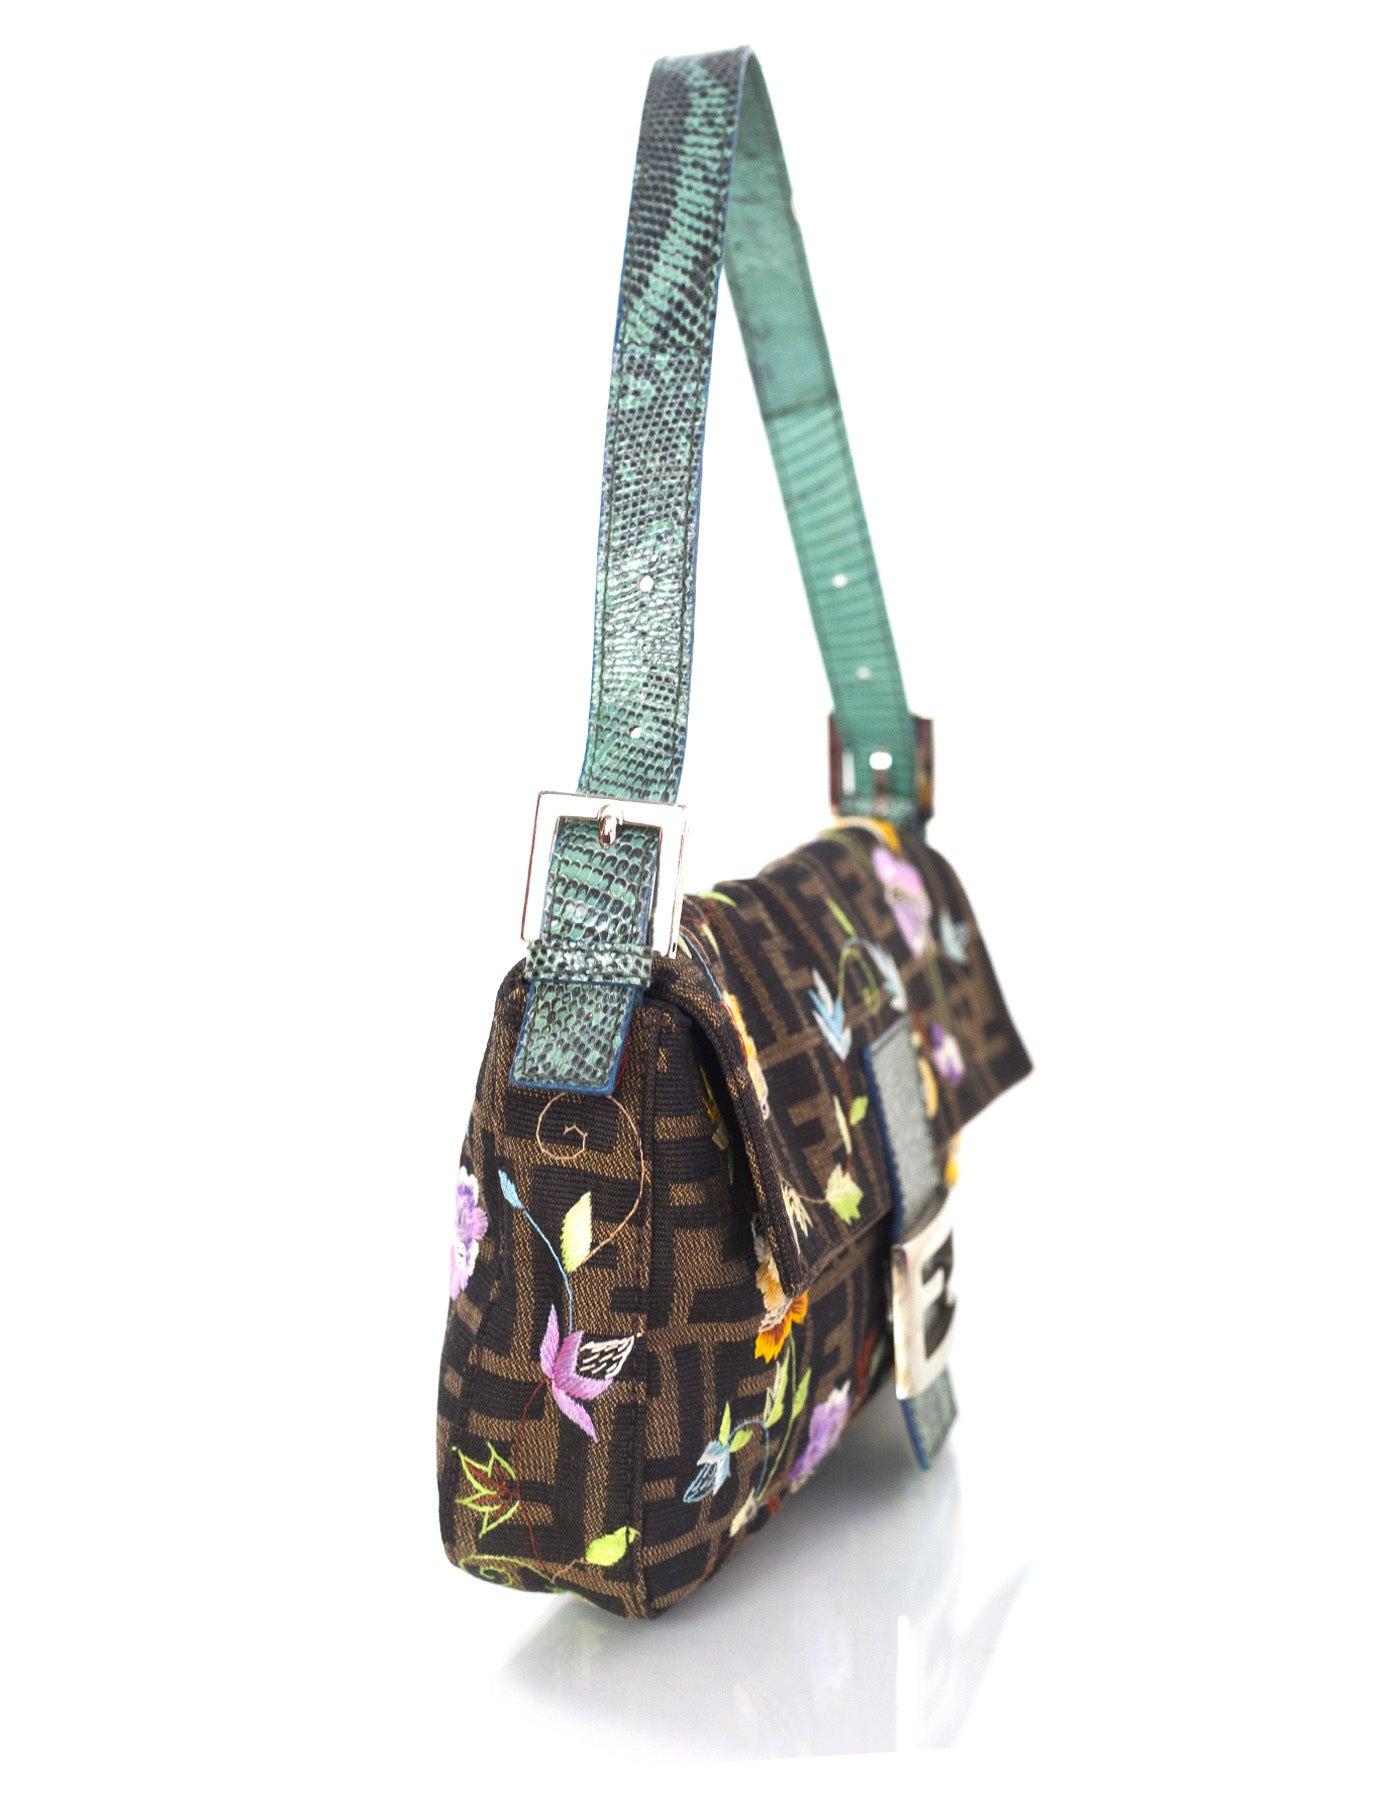 858169a73c65 Fendi Zucca Floral Embroidered Baguette Bag For Sale at 1stdibs